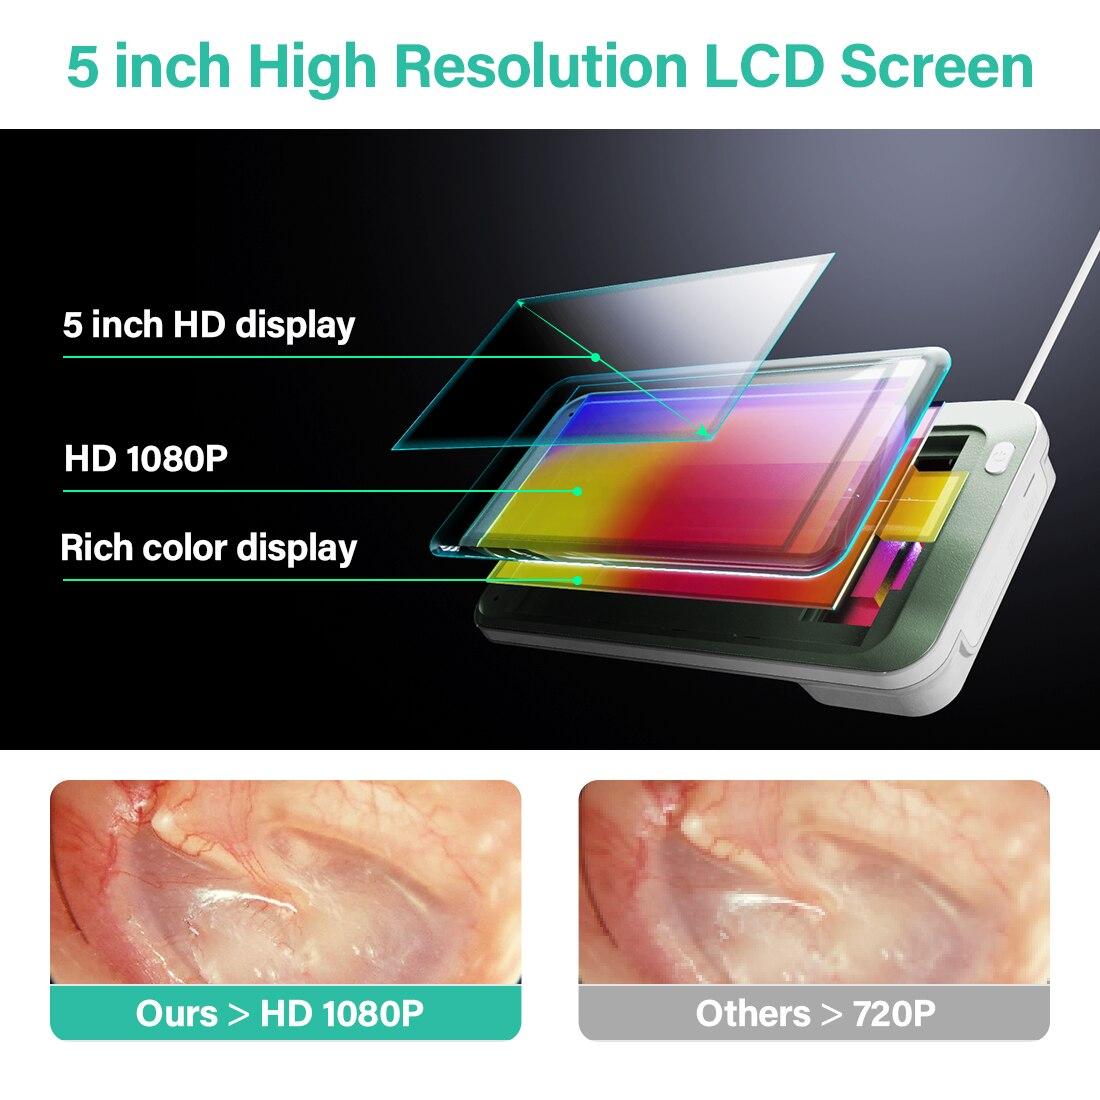 3.9mm HP 5 inch Screen Digital Otoscope Handheld Visual Ear Cleaning Scope Endoscope Earpick Camera Otoscope with 32GB TF Card